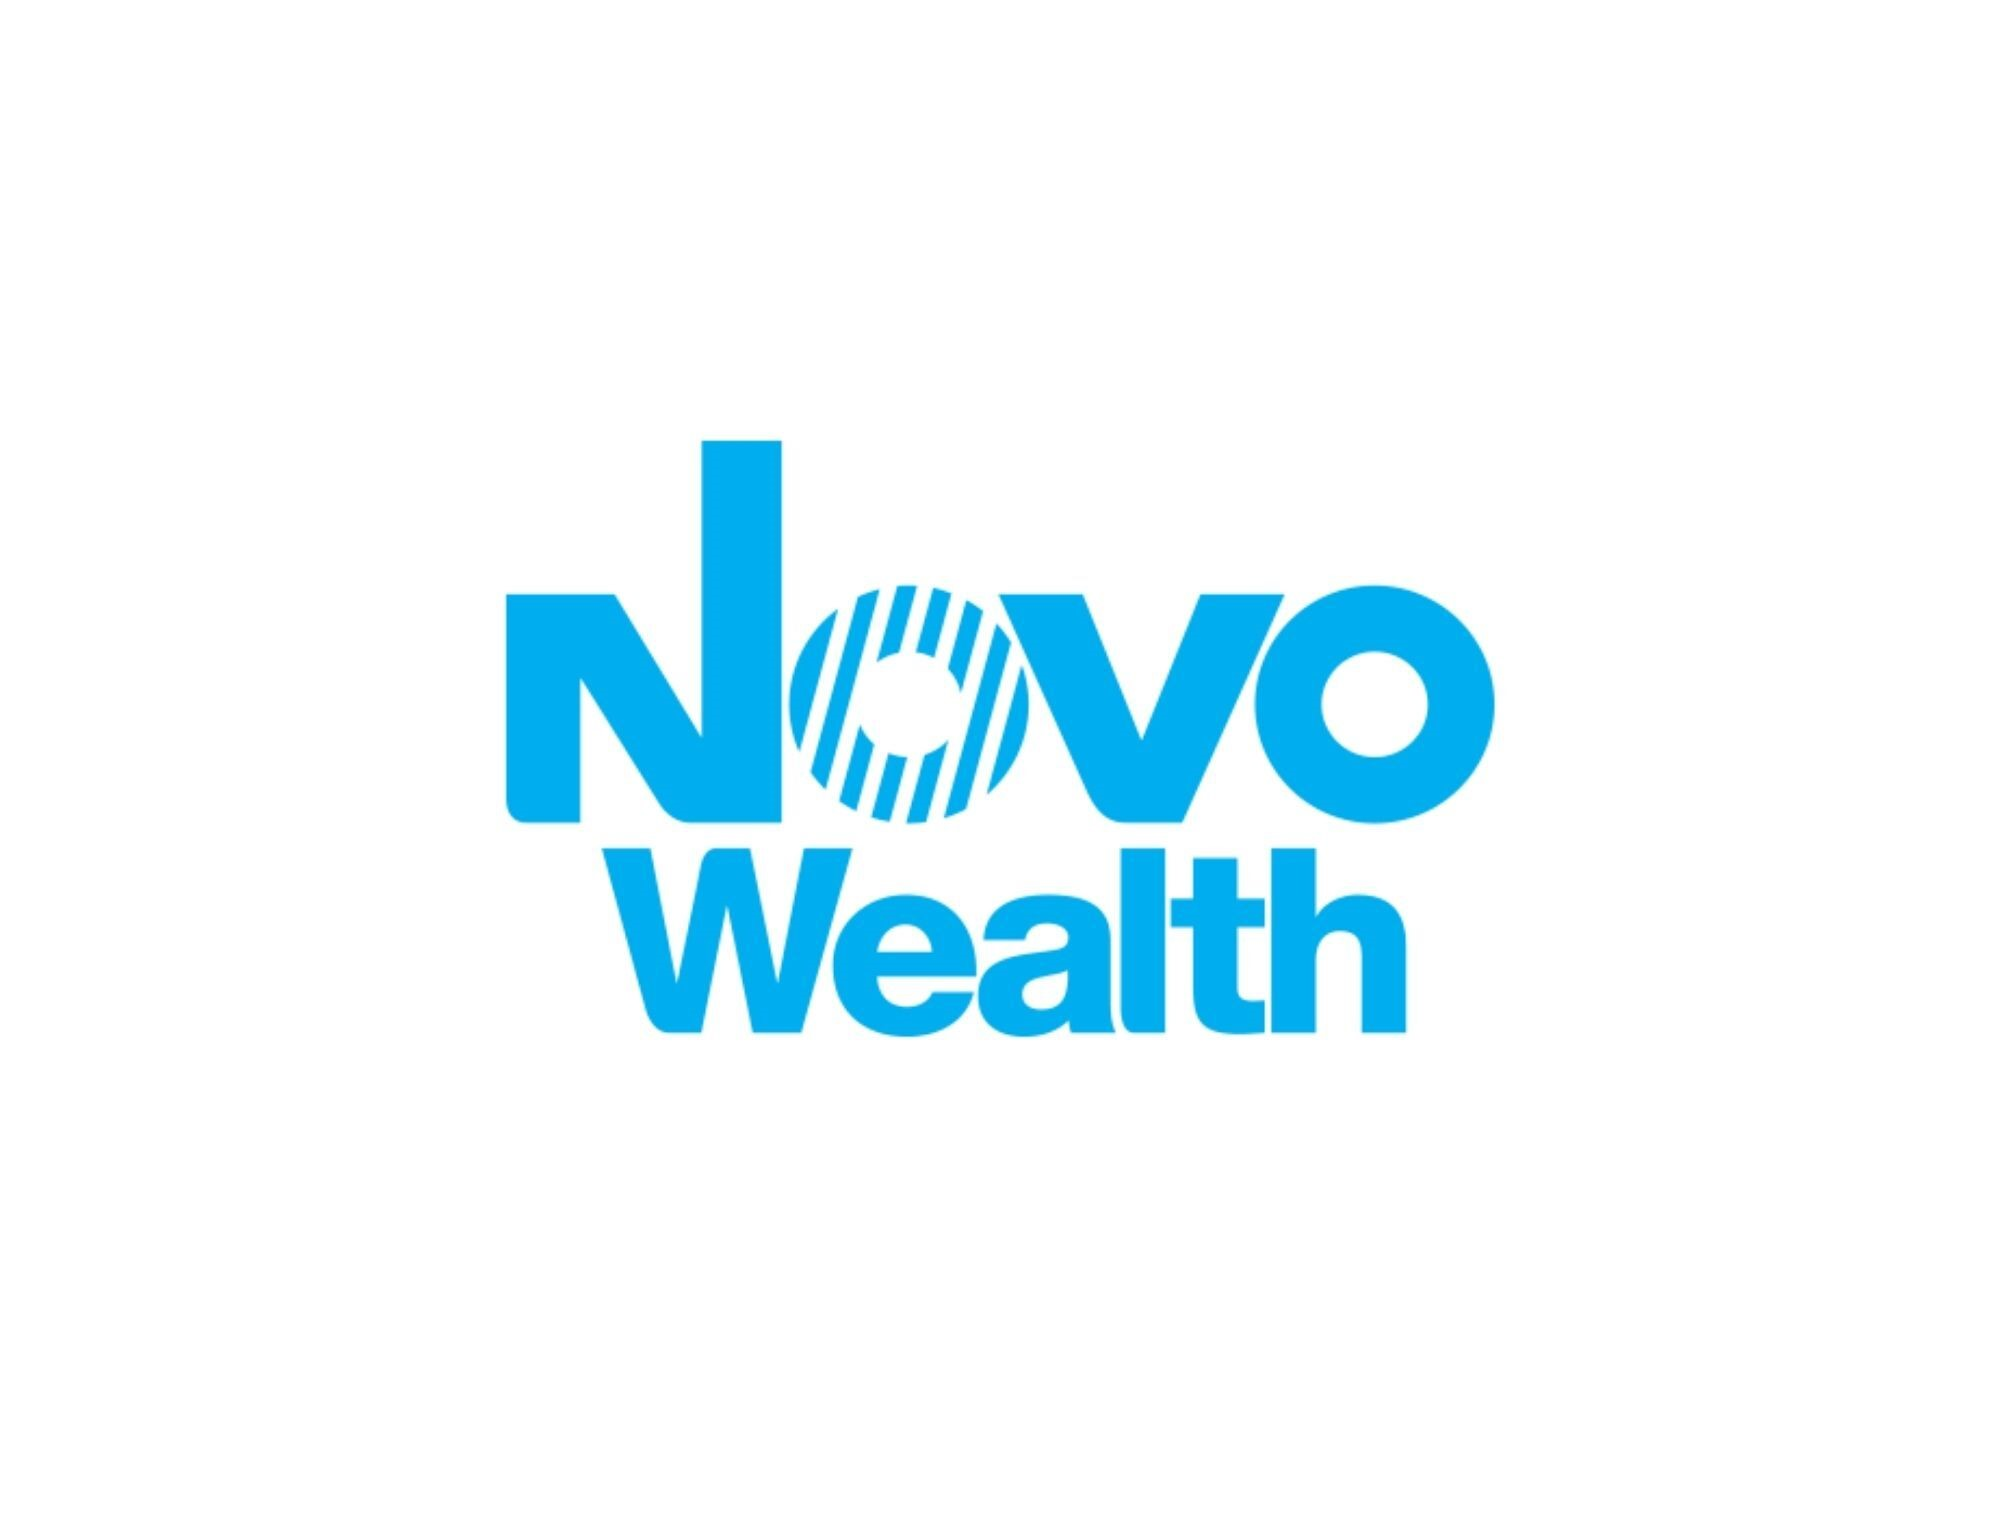 Novo Wealth